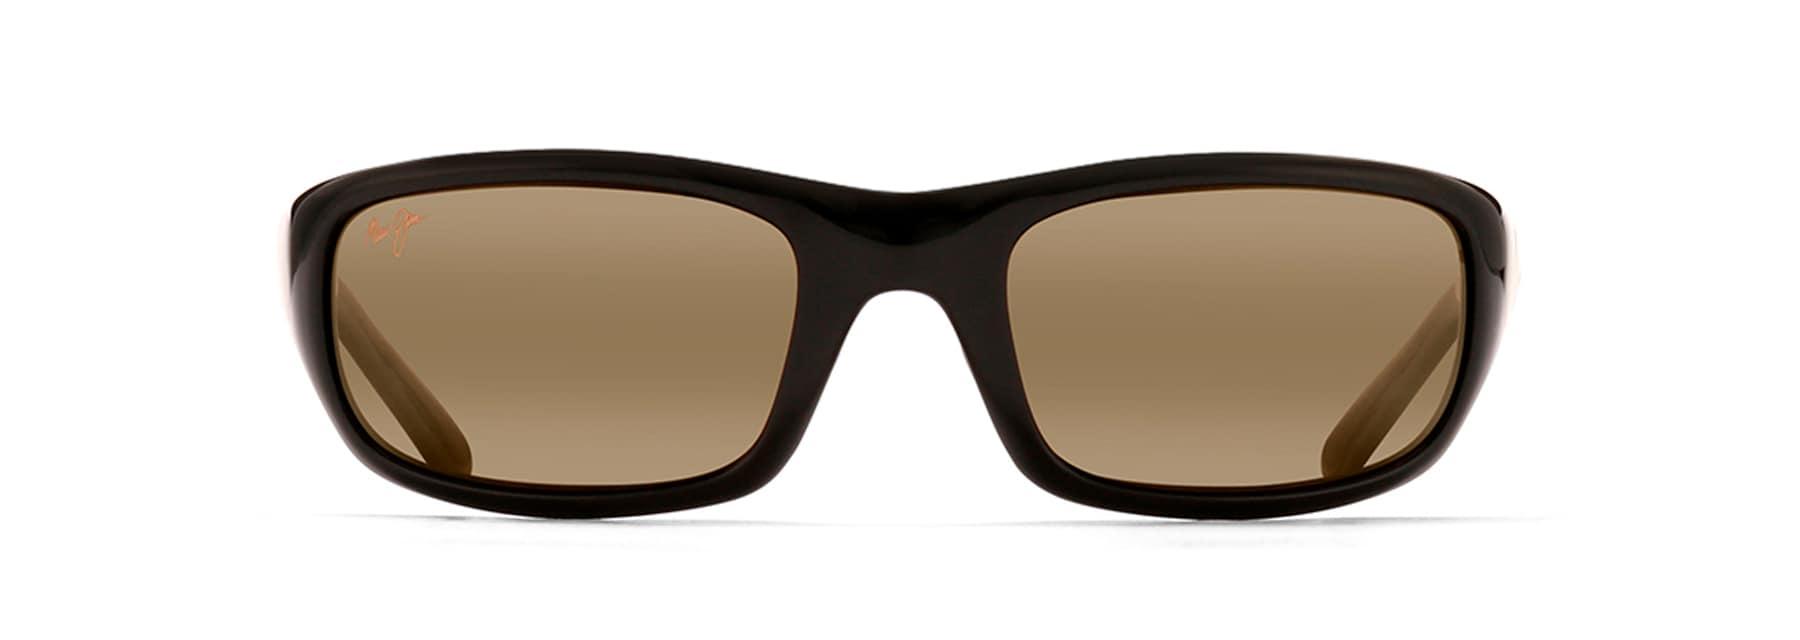 cd18f04ed033 Stingray Polarized Sunglasses | Maui Jim®